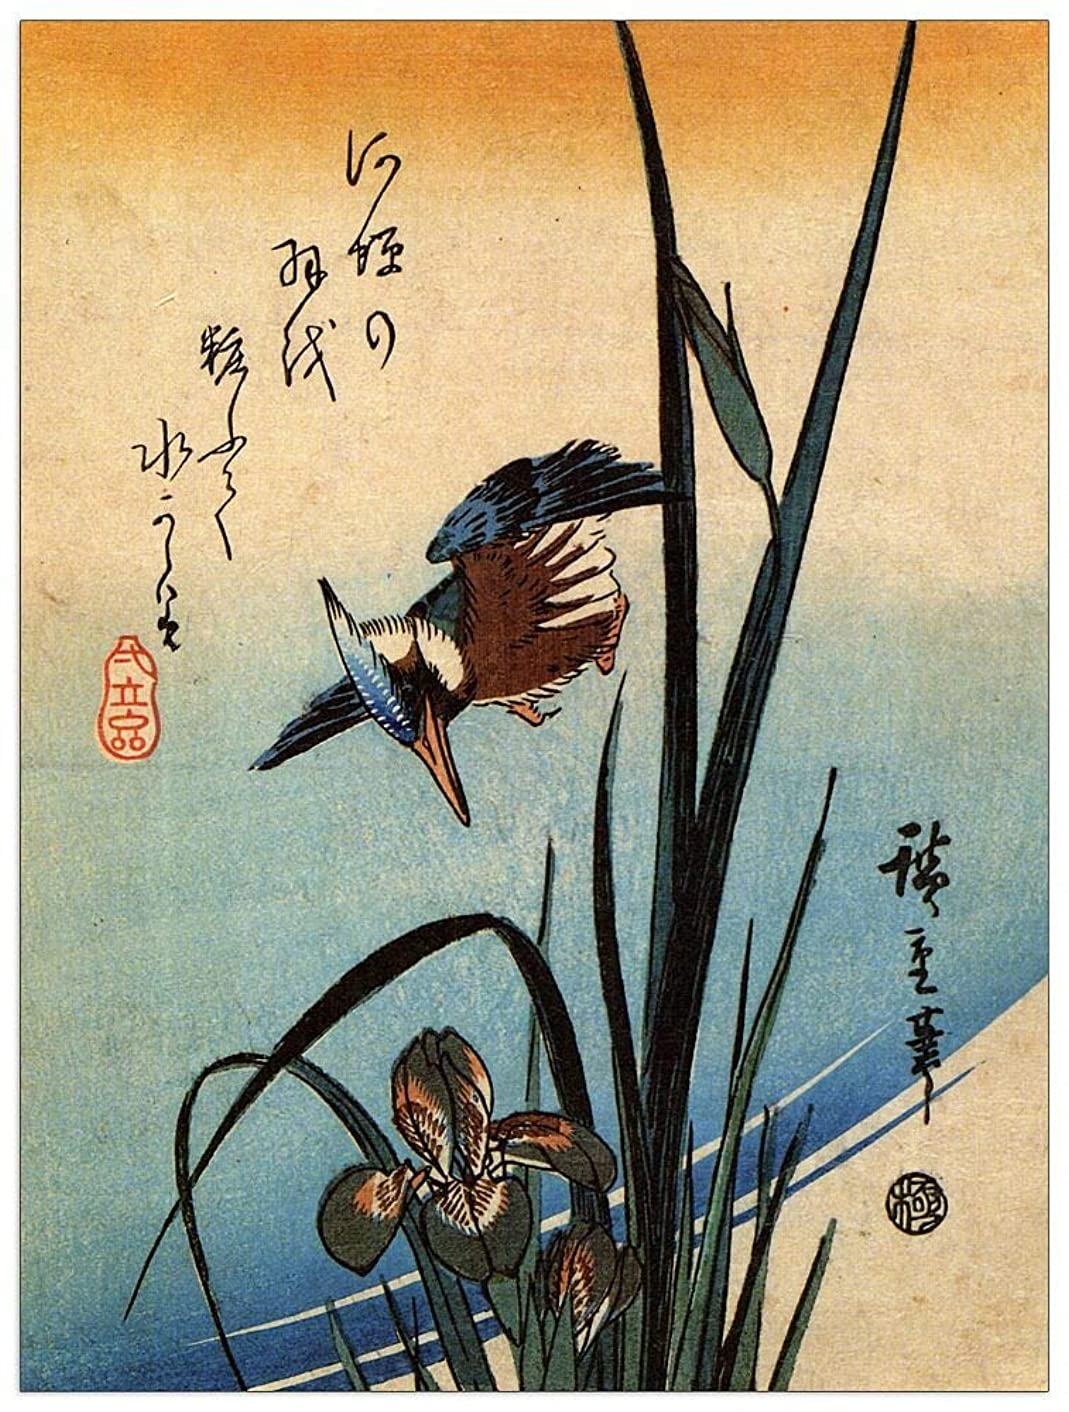 ArtPlaza TW92989 Hiroshige Utagawa - Kingfisher and Lilies II Decorative Panel 27.5x35.5 Inch Multicolored